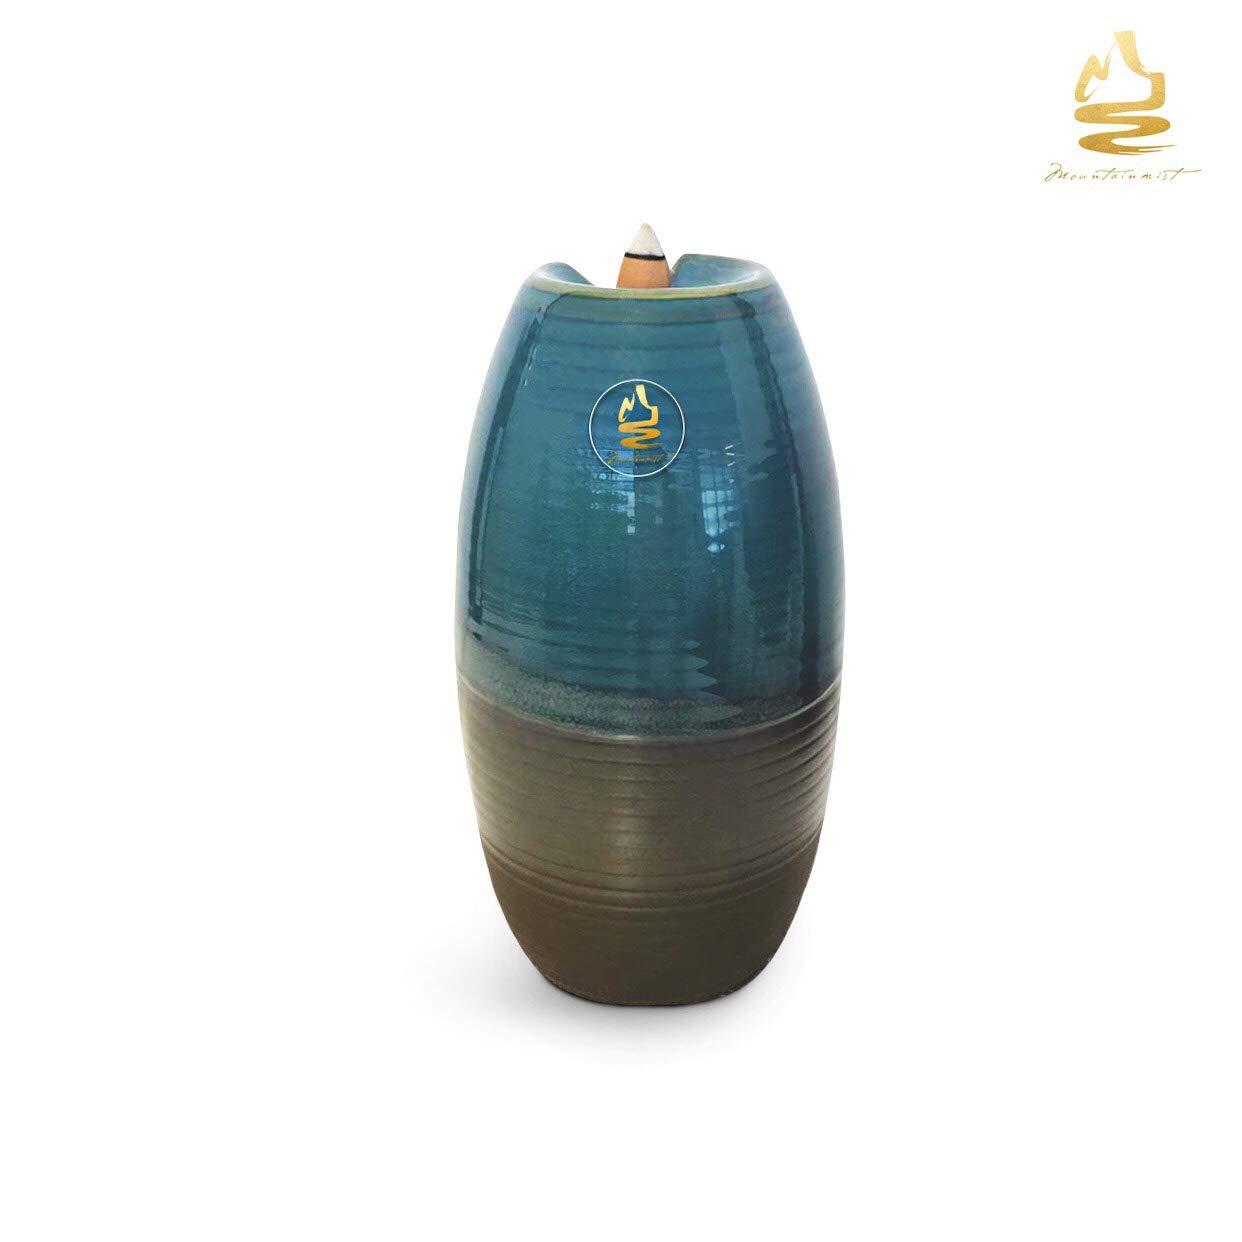 MountainMist Backflow Incense Burner | Incense Burner Holder | Premium 10 Pack Waterfall Backflow Incense Cones Included | Perfect Ornament Holder or Room Scent Diffuser | Bakhoor Burner Zen Decor by MountainMist (Image #9)